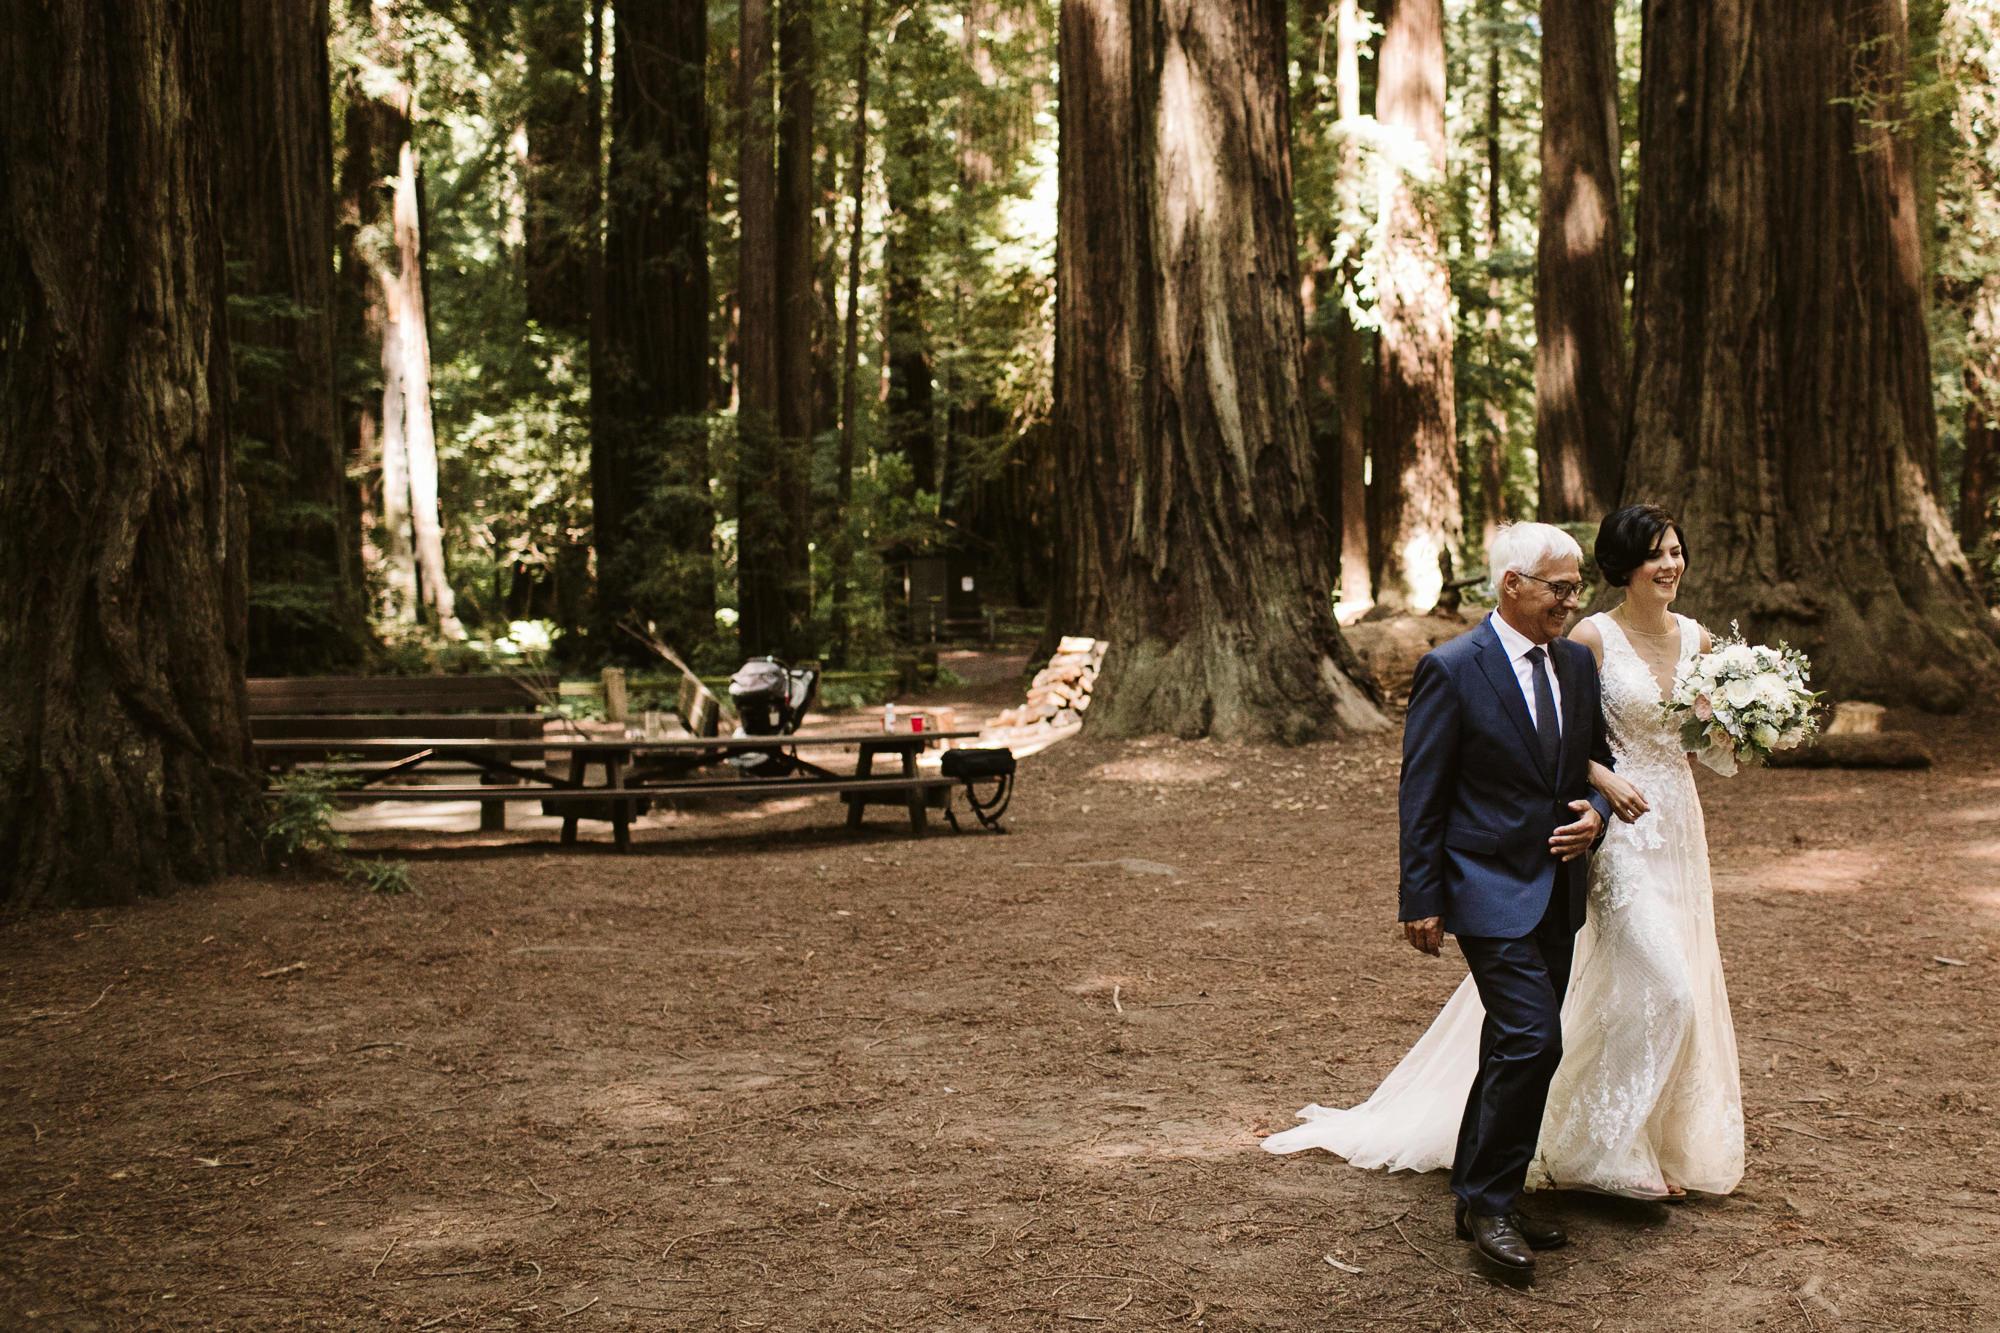 California-wedding-photographer-alfonso-flores-pamplin-groove-170.jpg